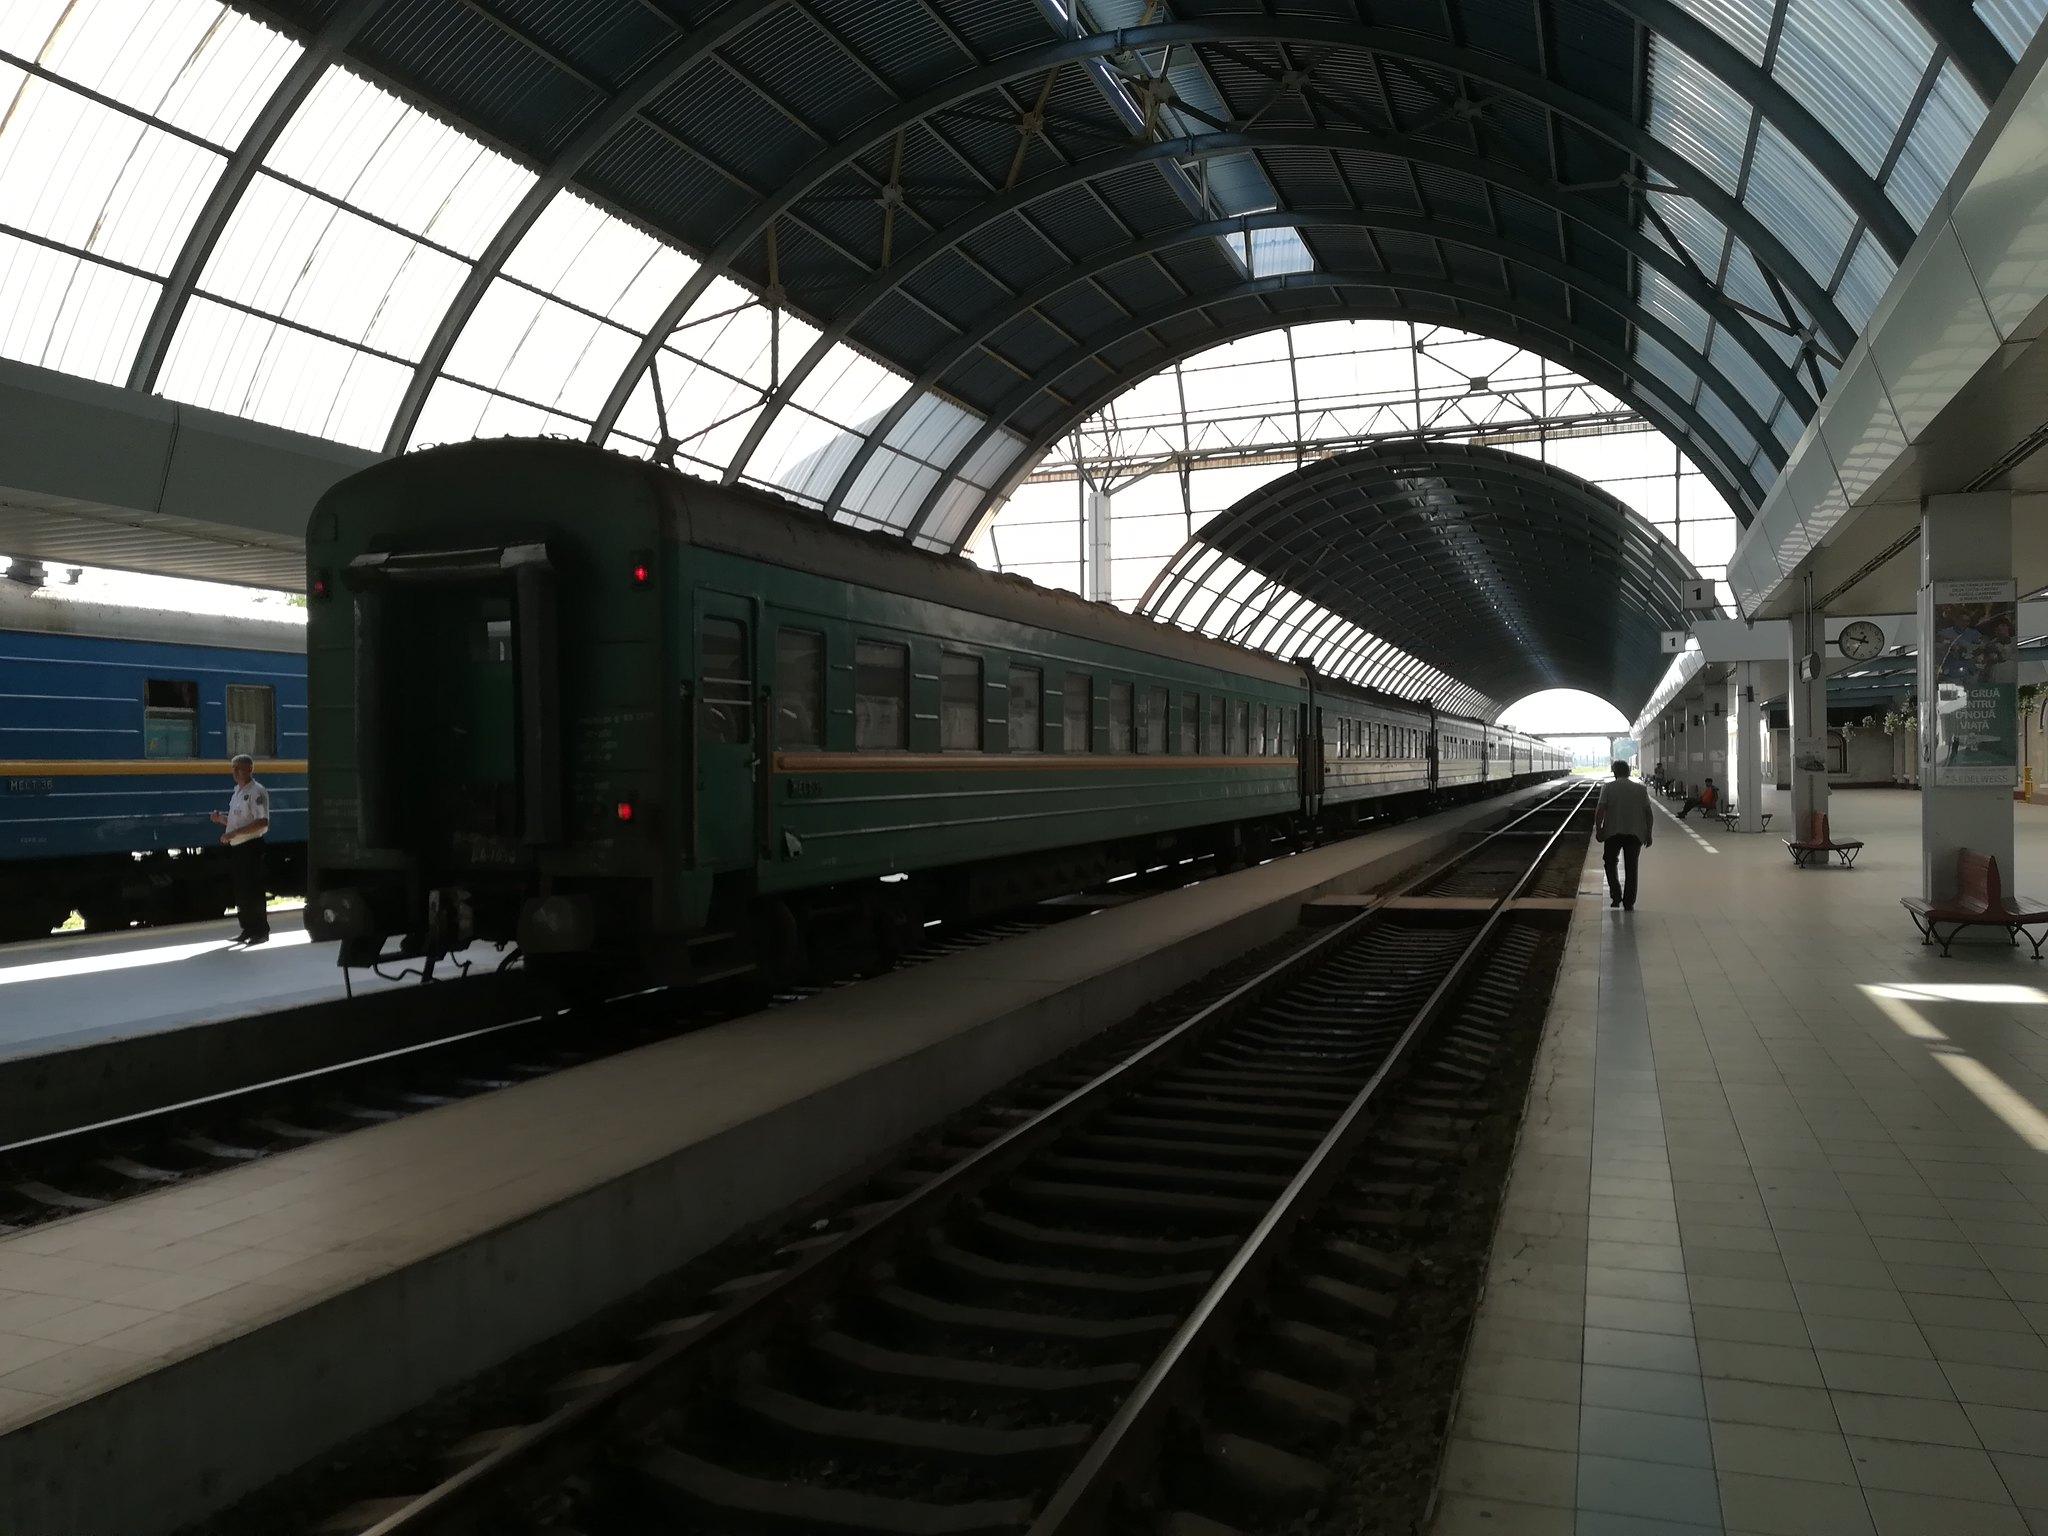 Reportaje feroviare Adirmvl - Pagina 15 29921930557_2366d017af_k